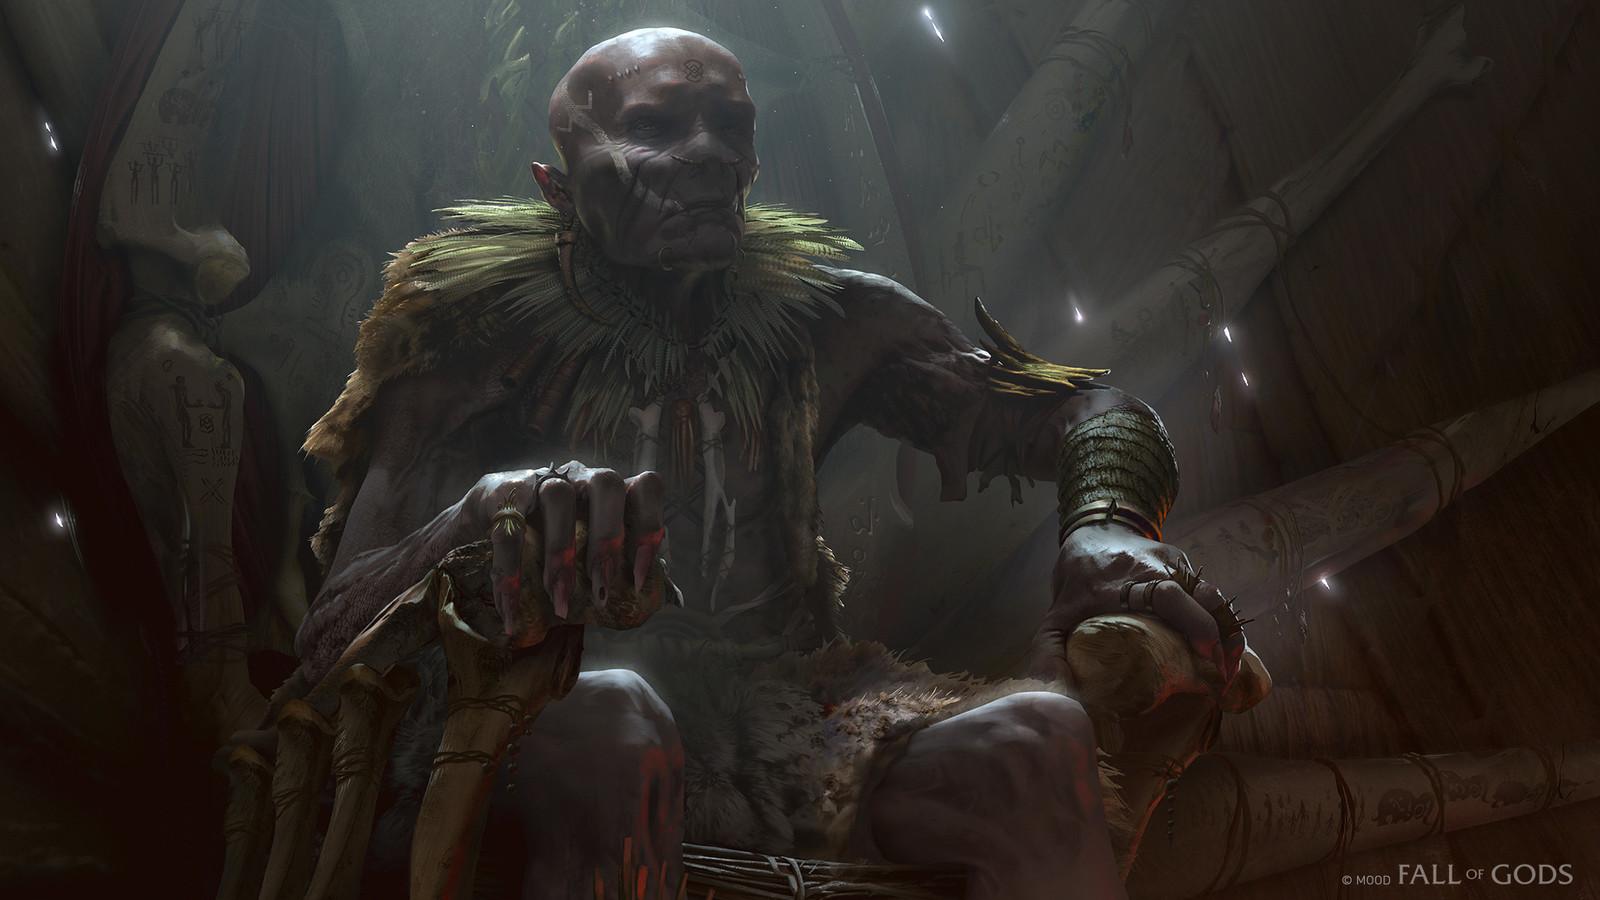 Fall Of Gods - Utgard Throne